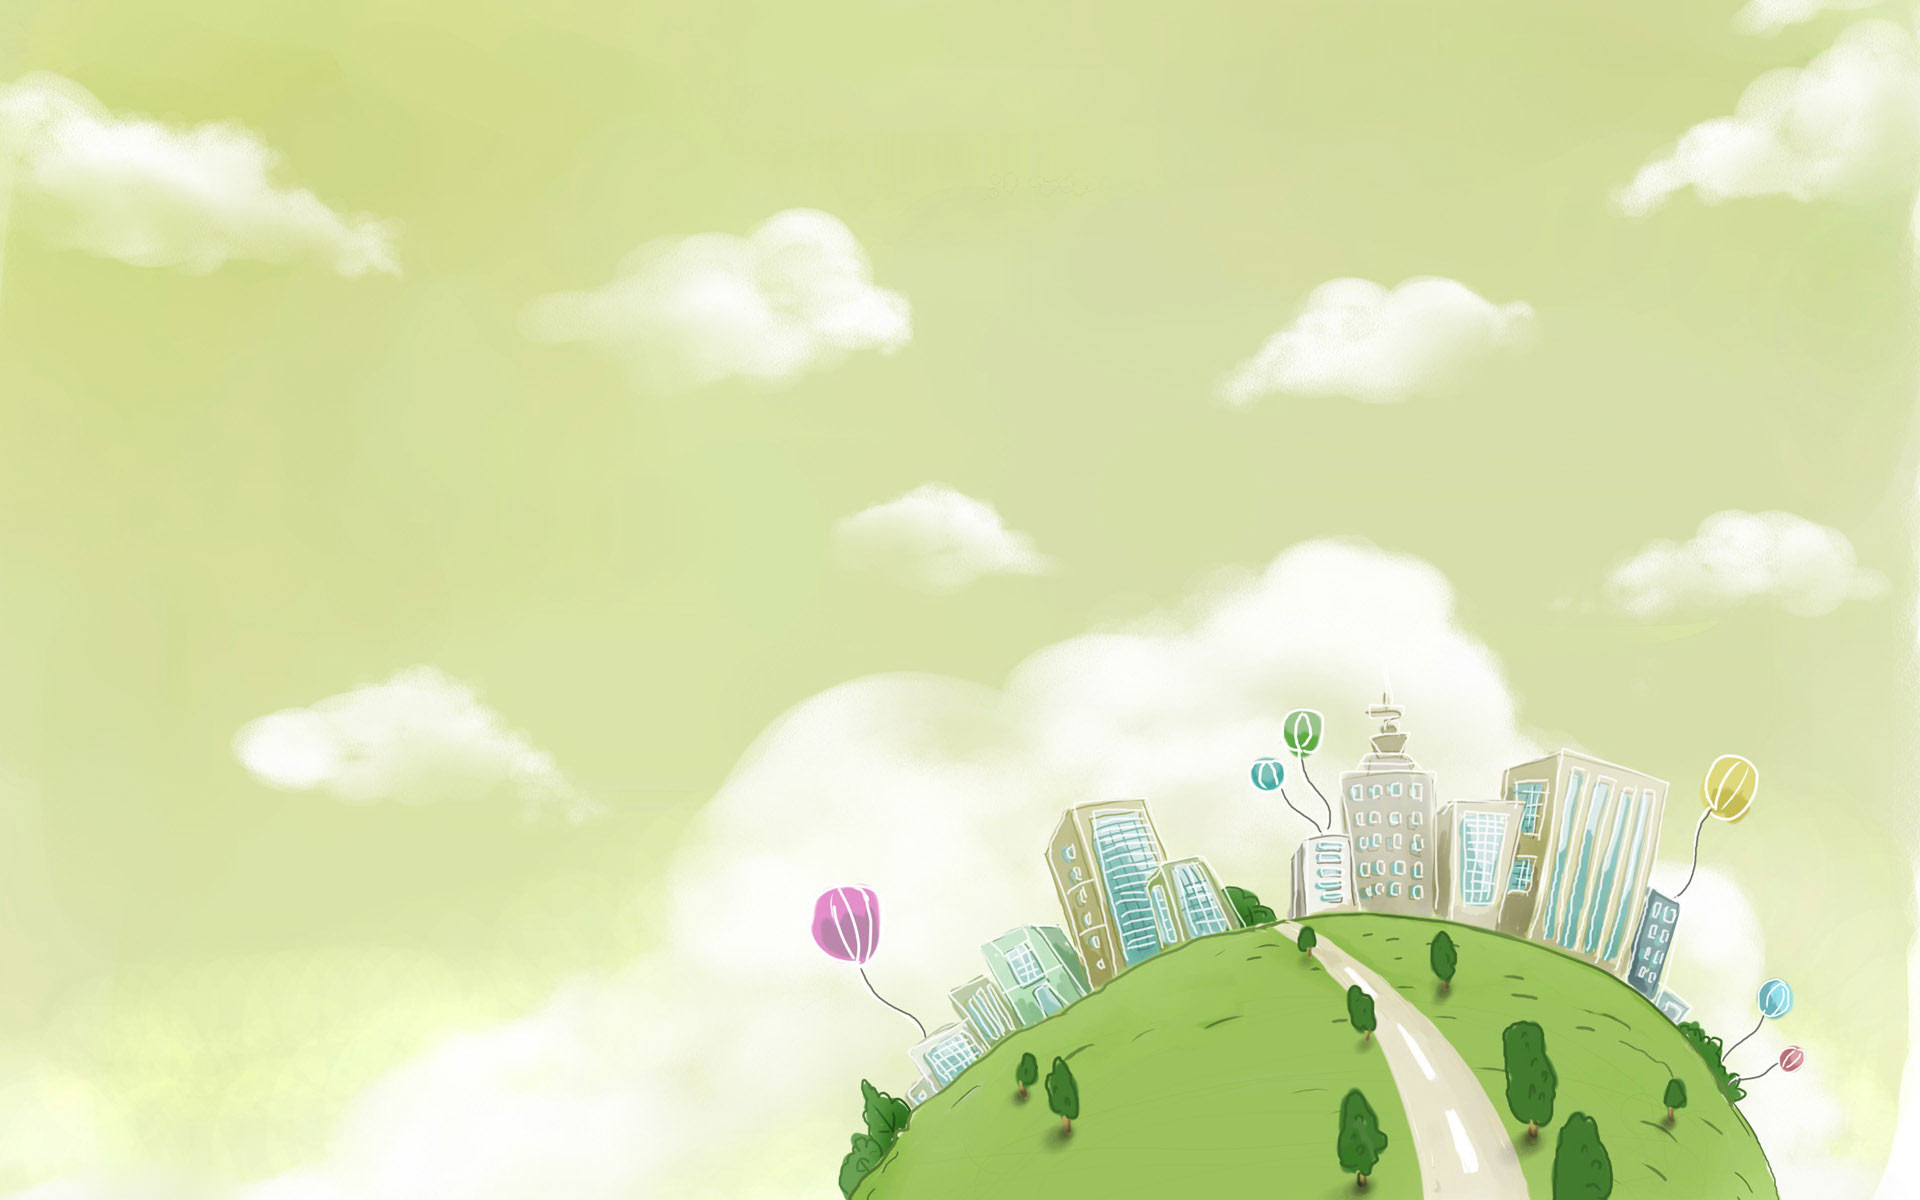 Cute Cartoon Wallpapers Creative CanCreative Can   HD Wallpapers    Pinterest   Cartoon wallpaper and Wallpaper